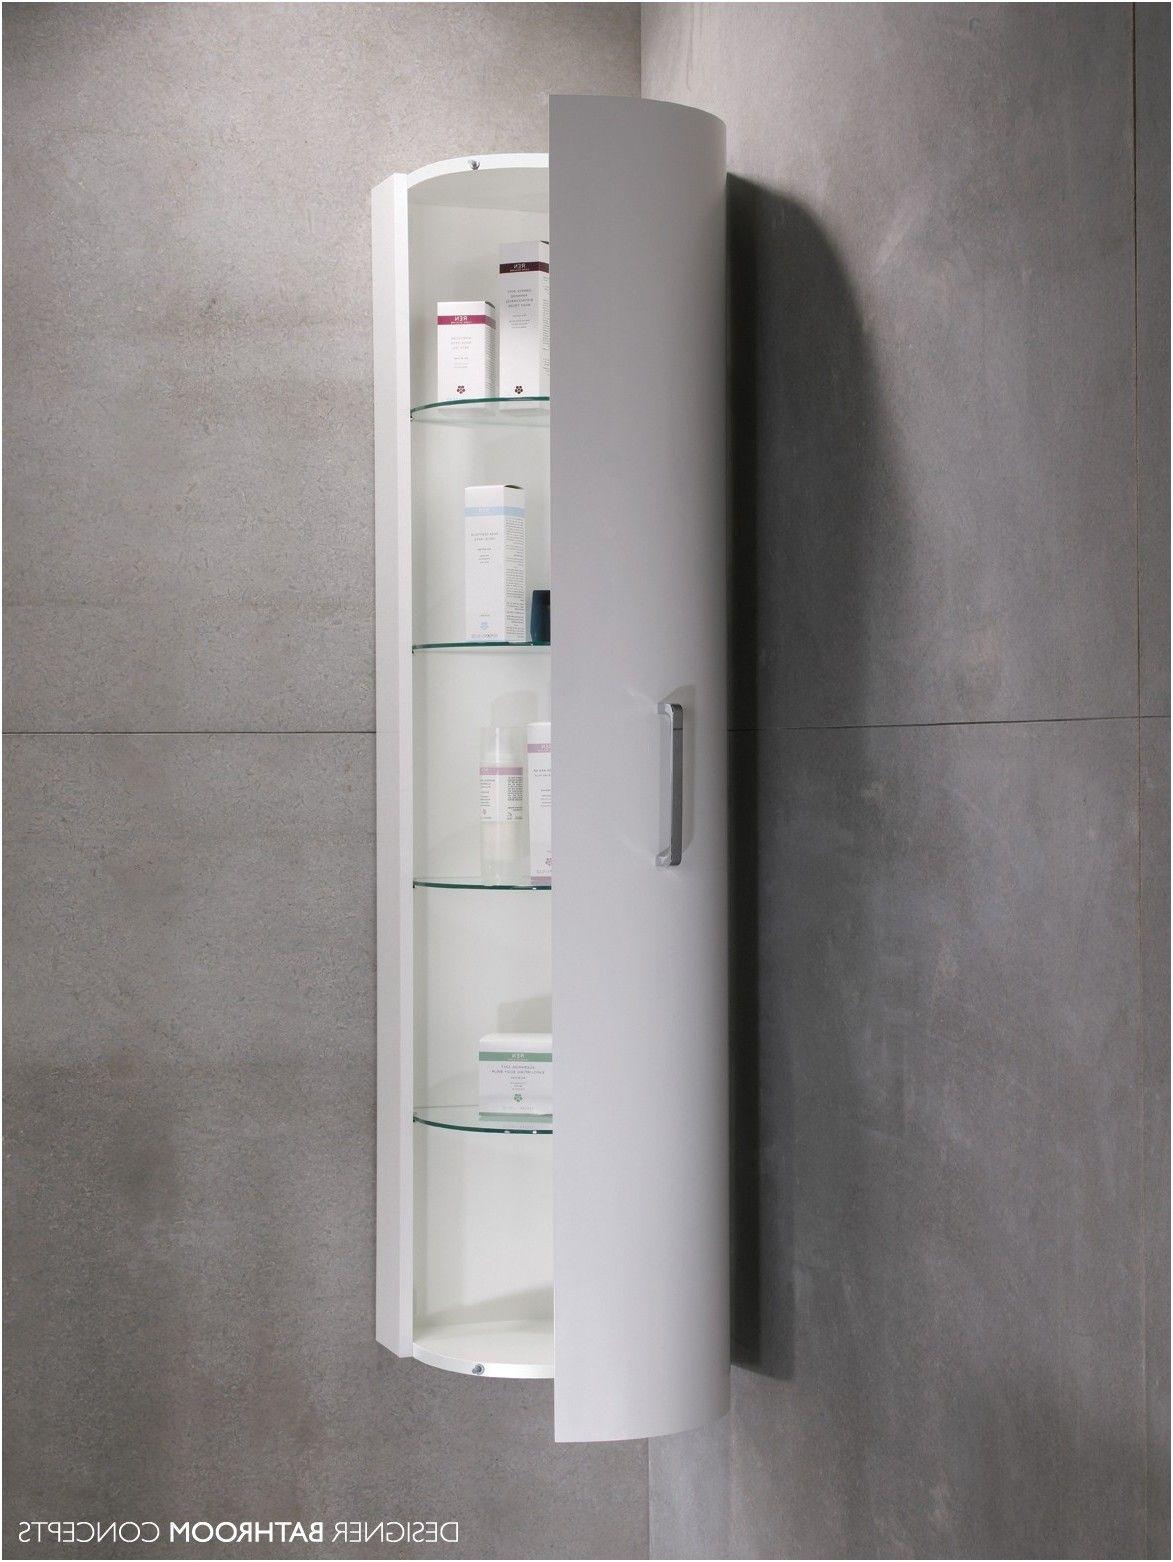 Bathroom Lowes Bathroom Cabinets Wall Medicine Cabinet Ikea From White High Gloss Bathroom Cabinet